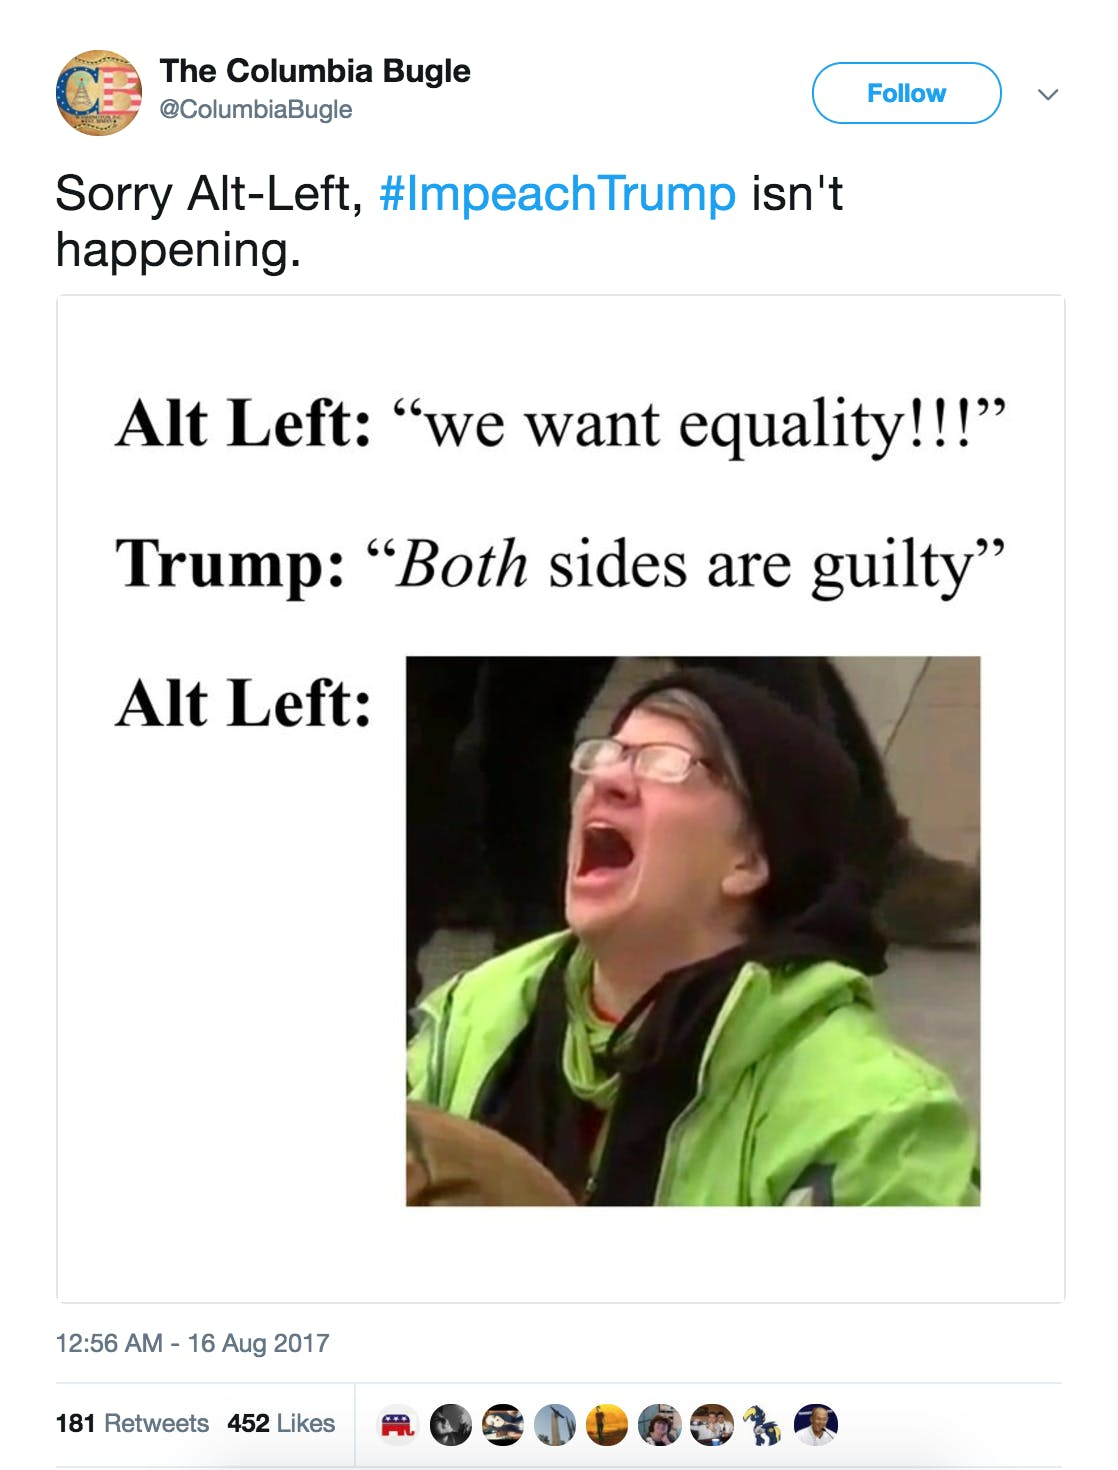 what is alt-left